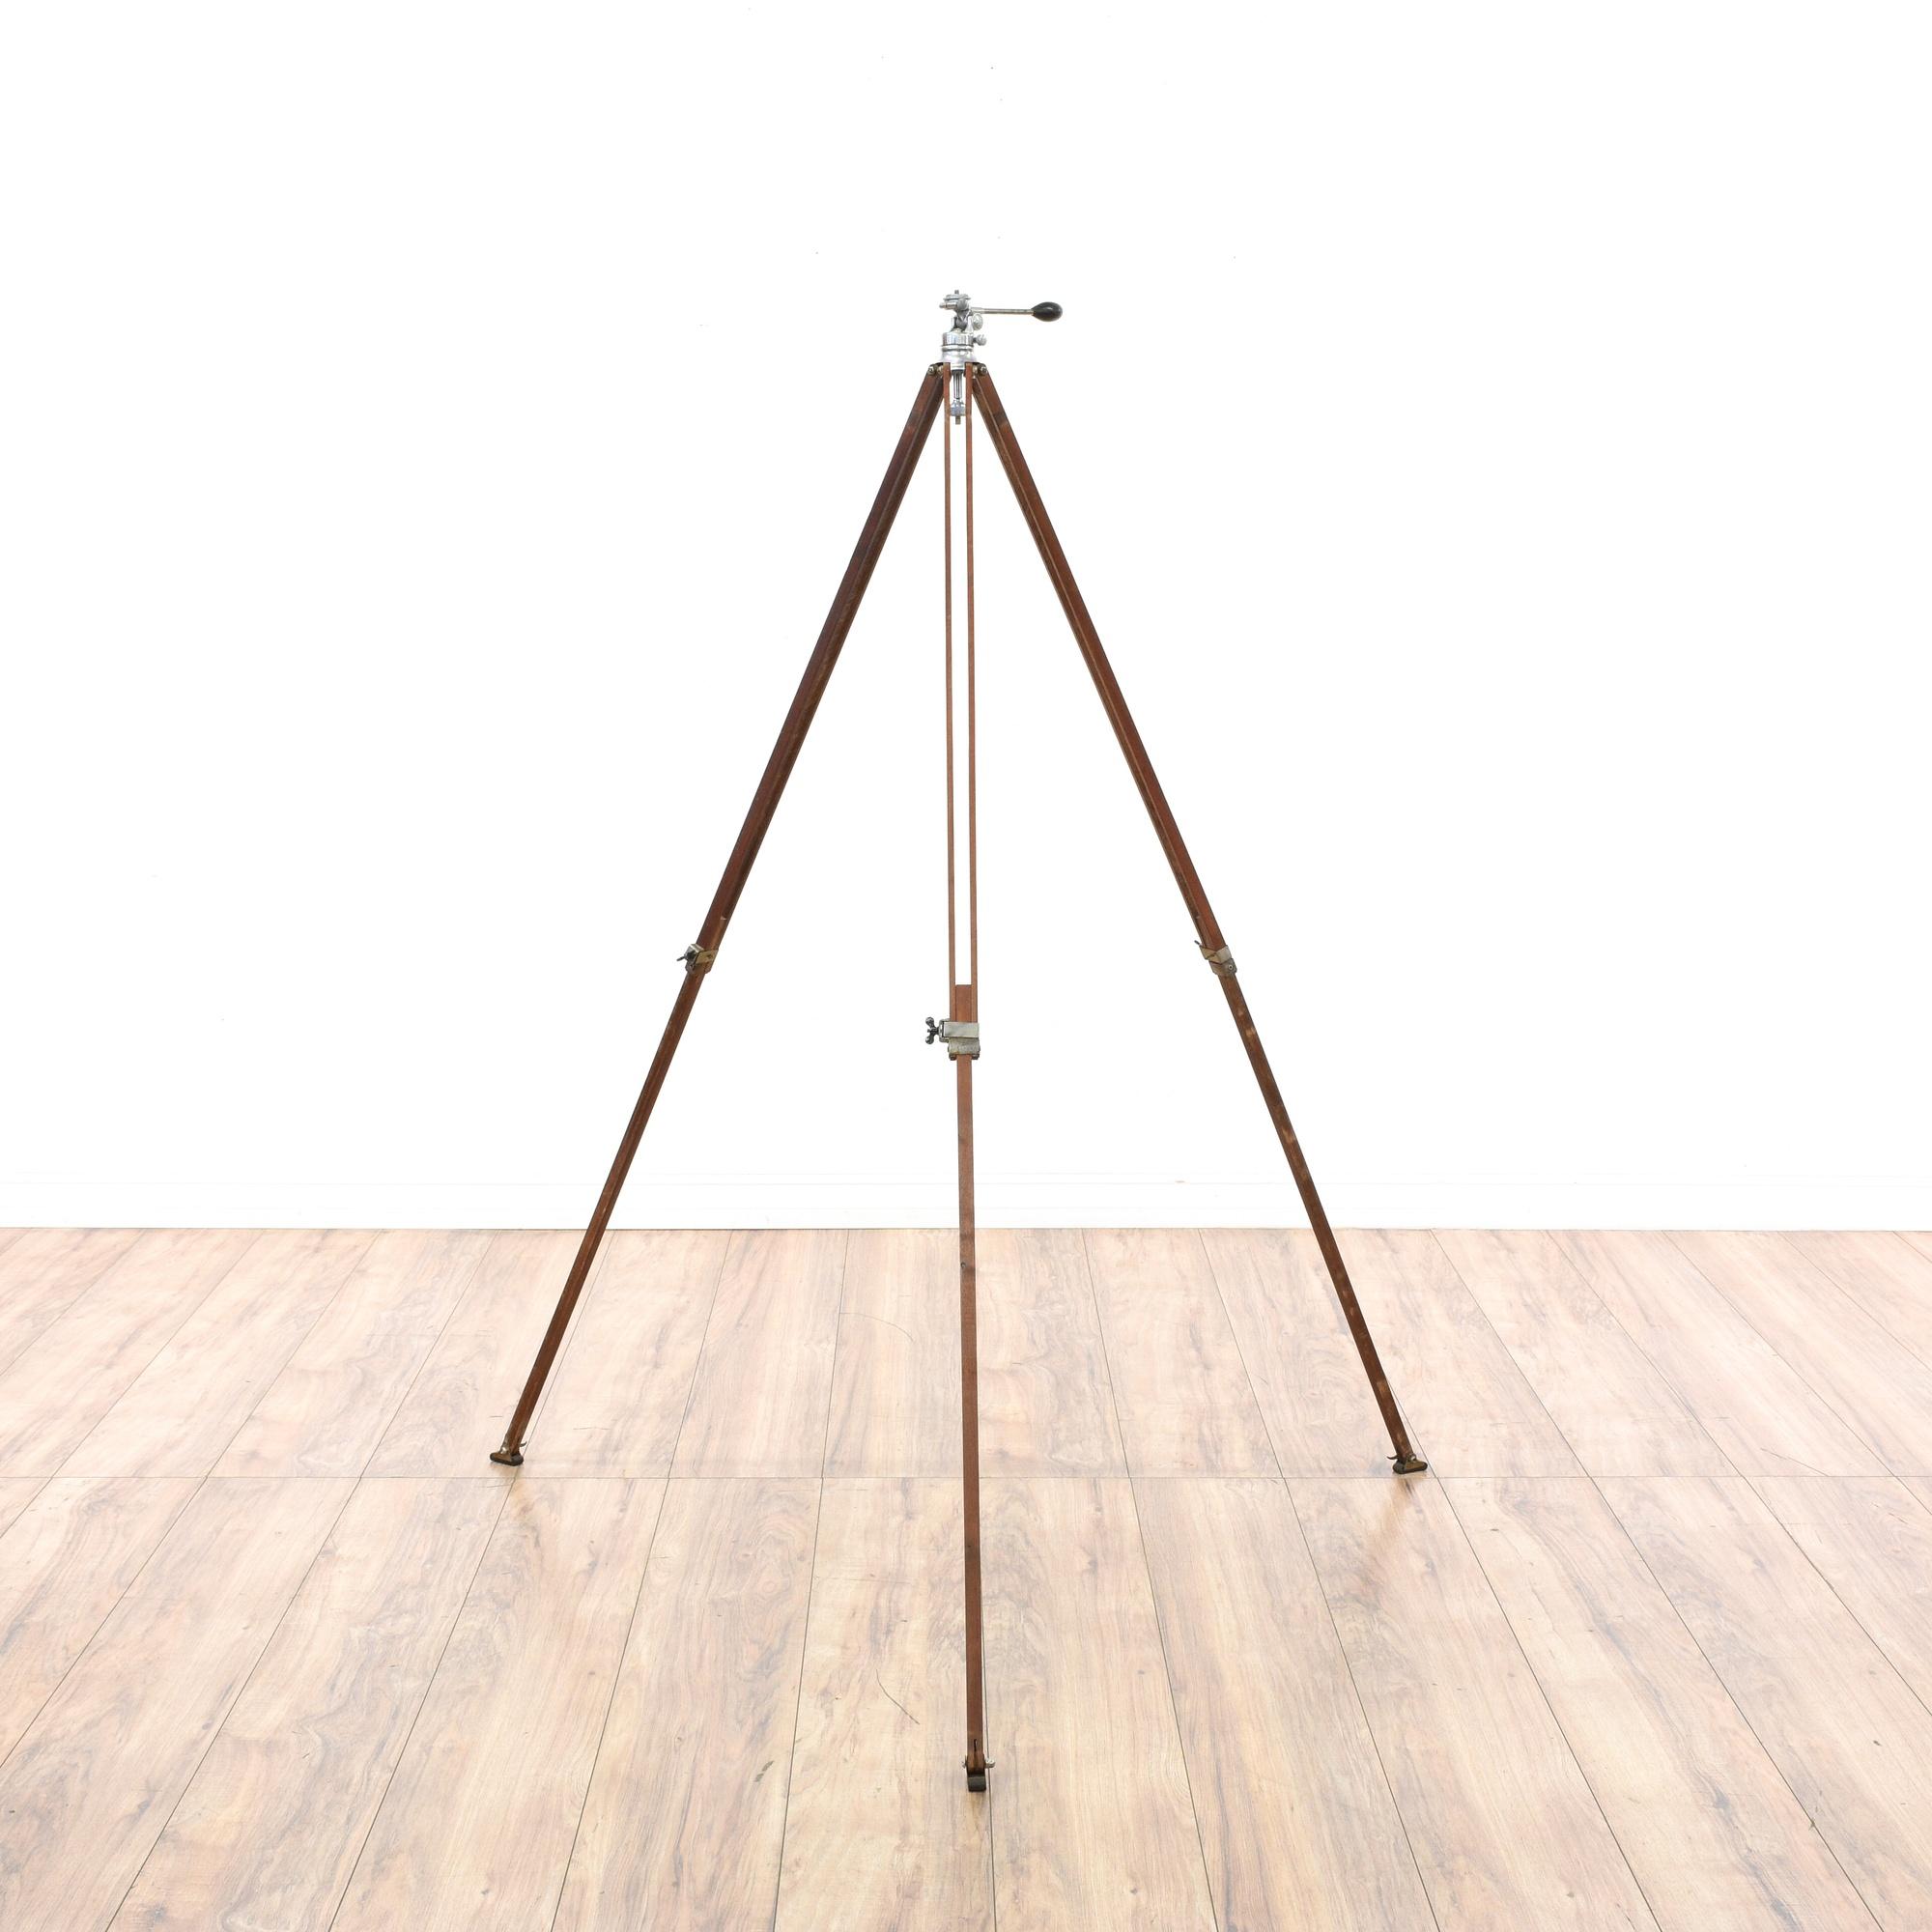 Folding Wood Camera Tripod Stand Loveseat Vintage